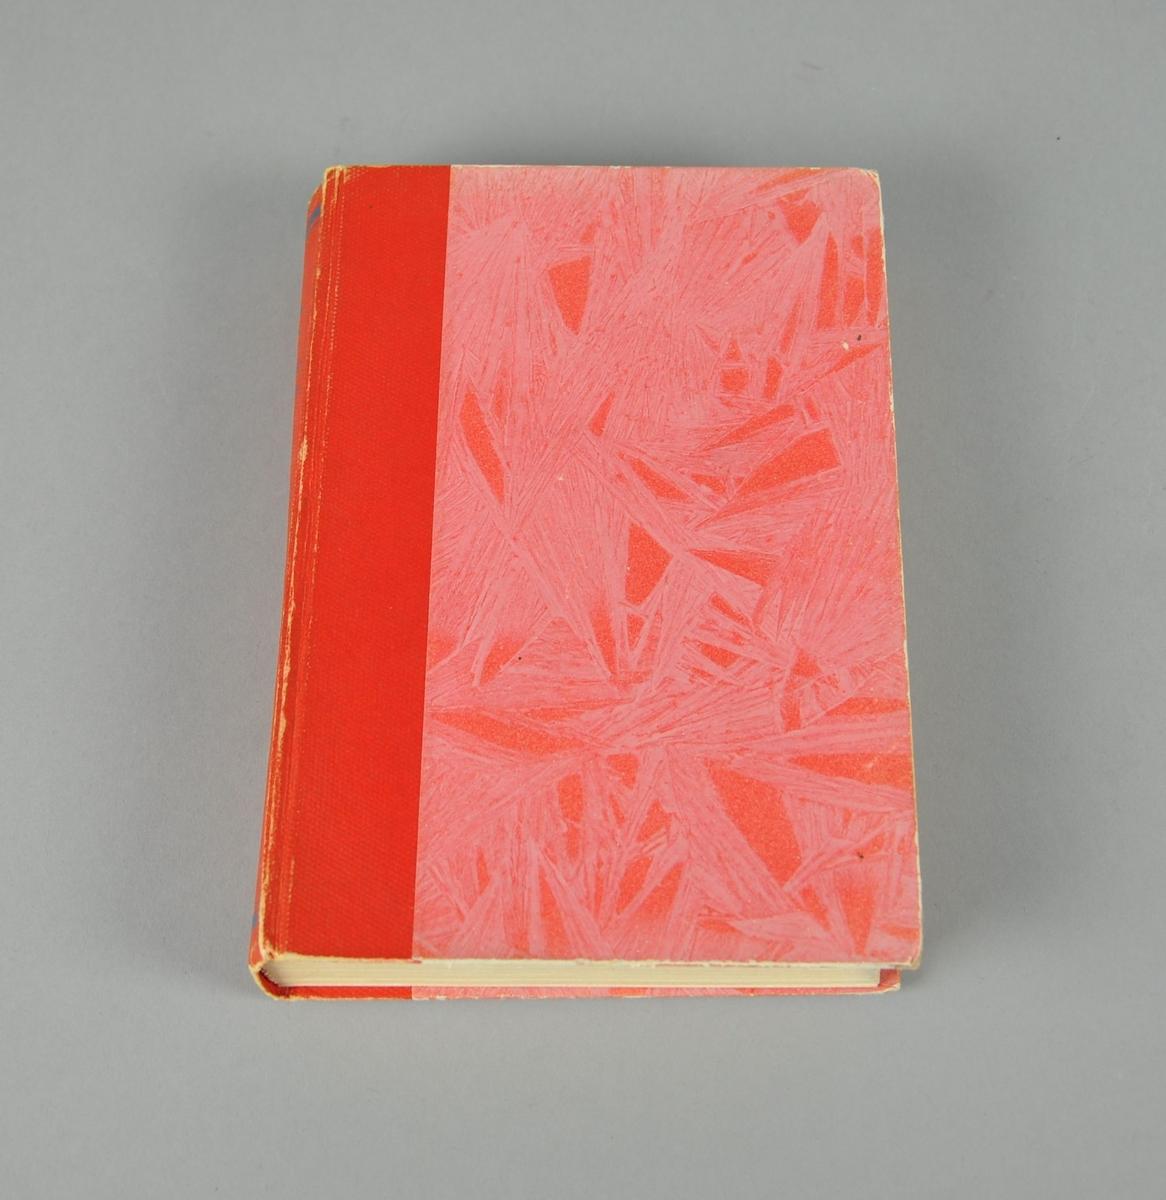 s. 159.